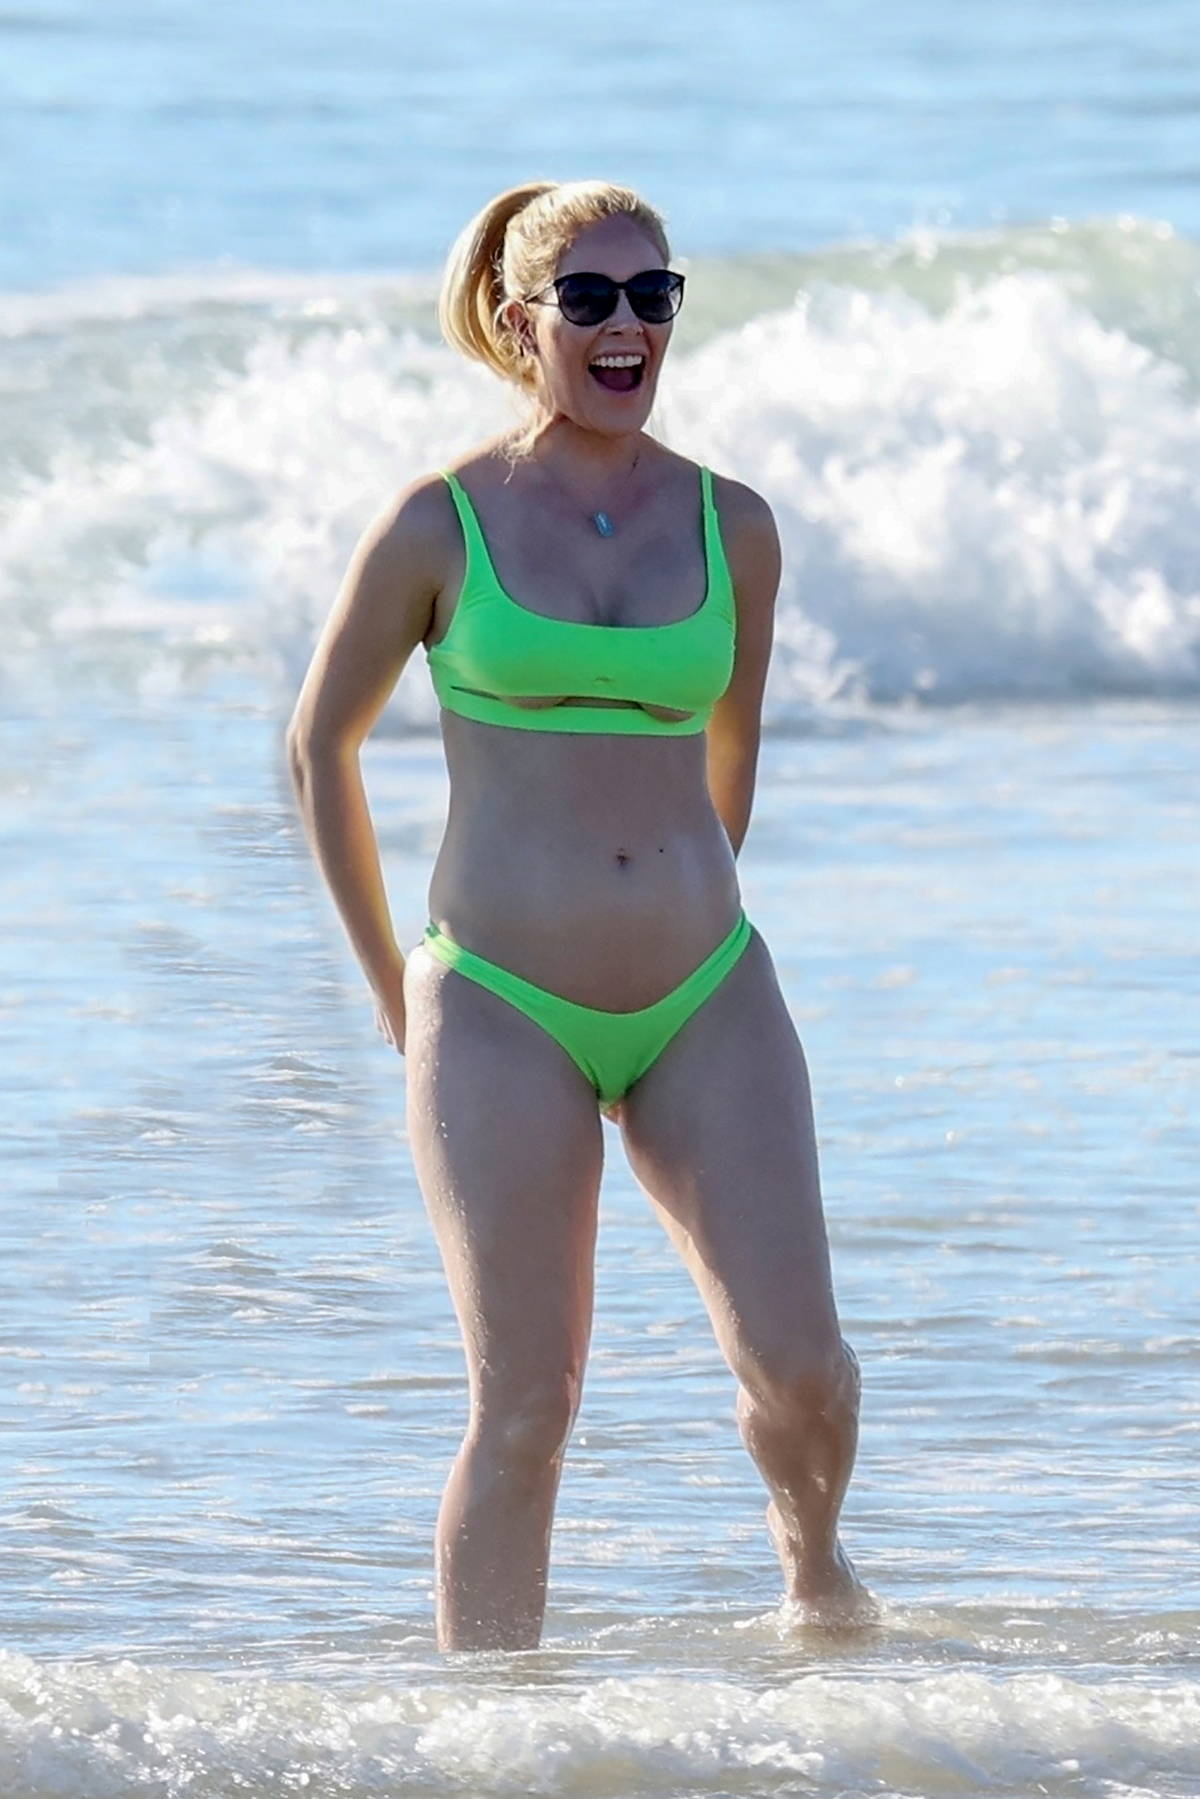 Heidi Montag sparks pregnancy rumors as she frolics on the beach wearing a green bikini in Carpinteria, California